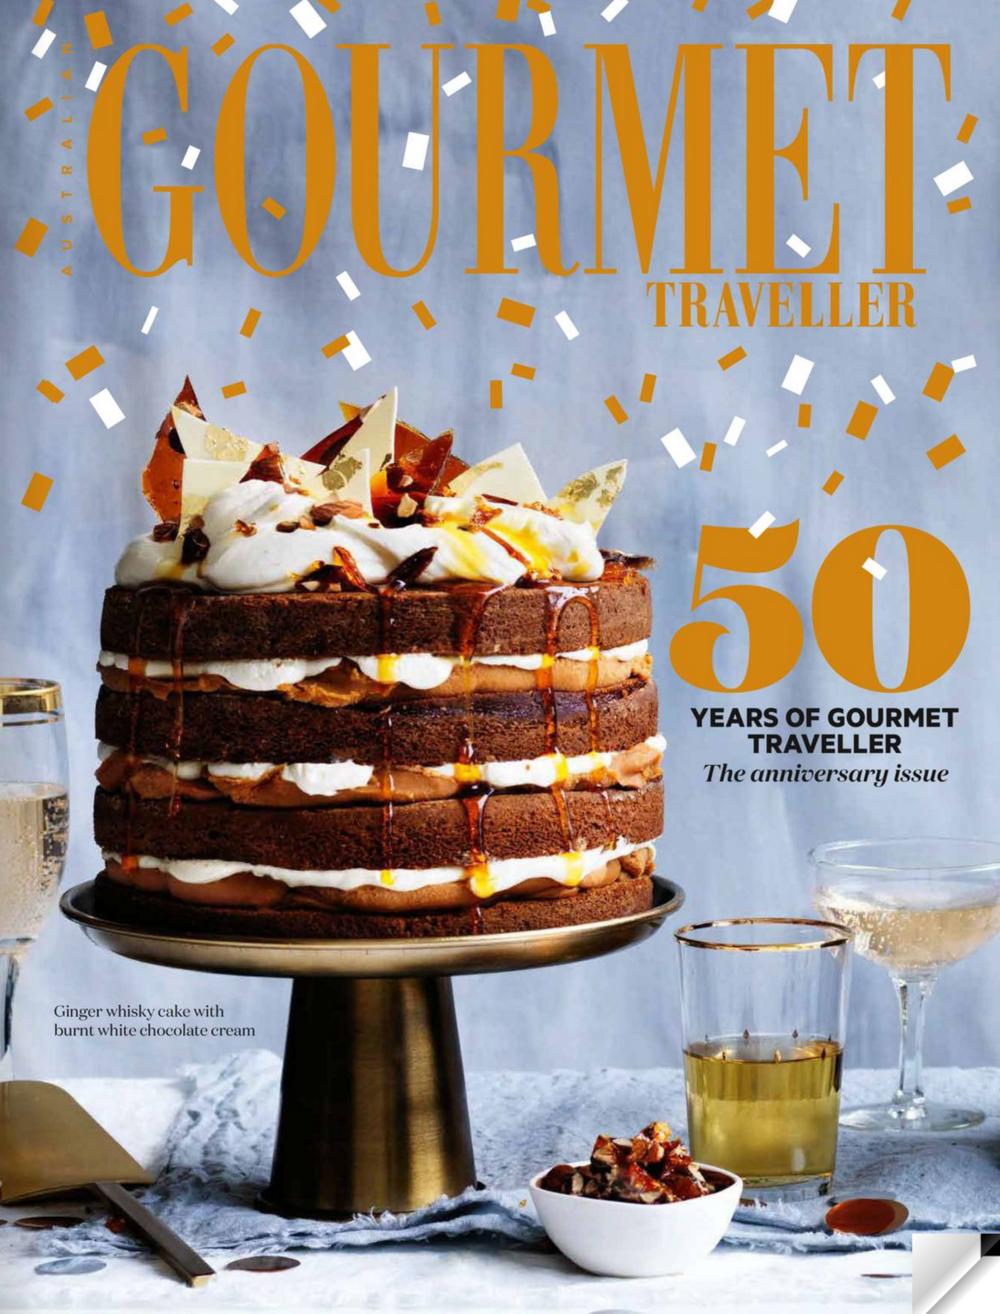 Copy of Gourmet Traveller 50 Years